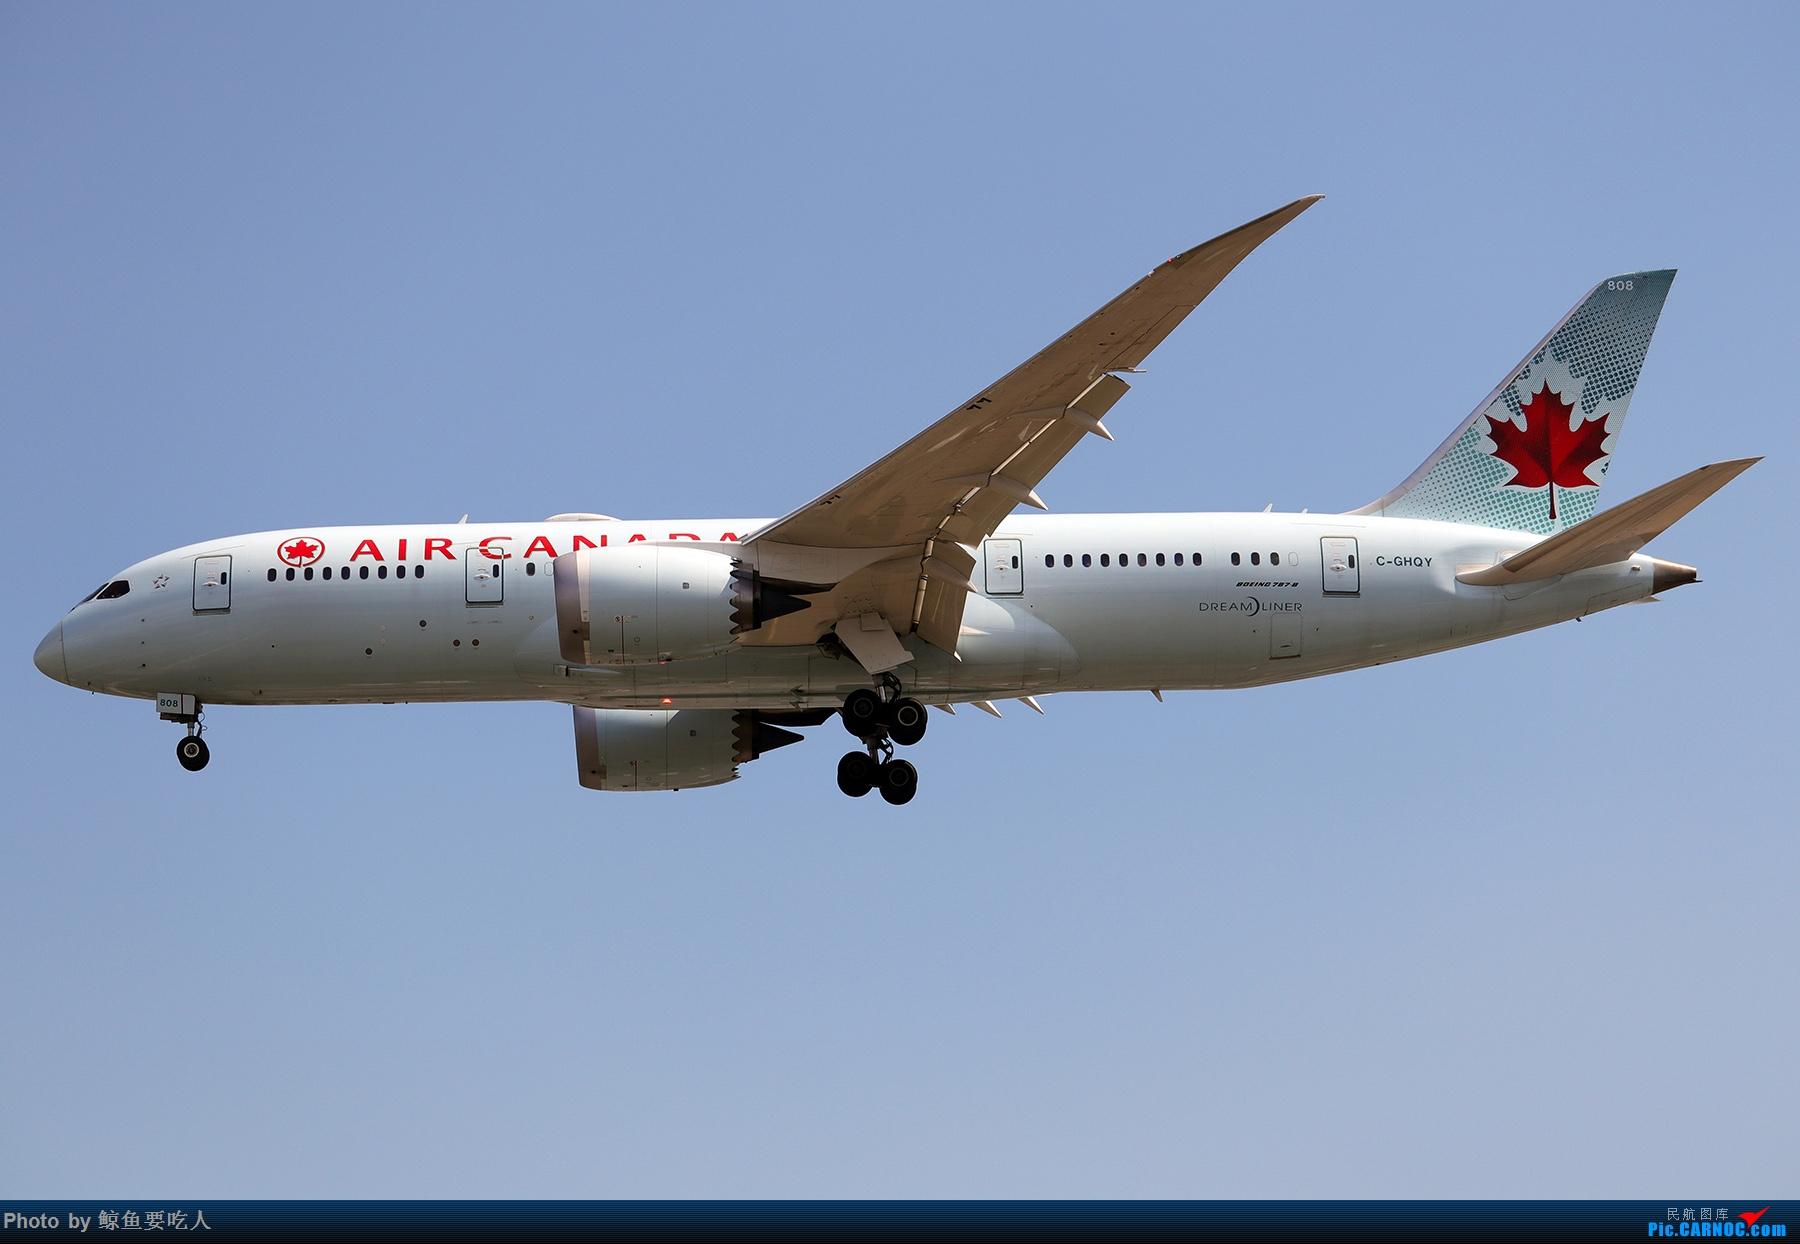 Re:[原创]【多图党】见证疫情后逐步的恢复,加拿大夏日多伦多皮尔逊机场拍机~ 乐见诸航空公司复航多伦多 BOEING 787-8 C-GHQY 多伦多皮尔逊国际机场